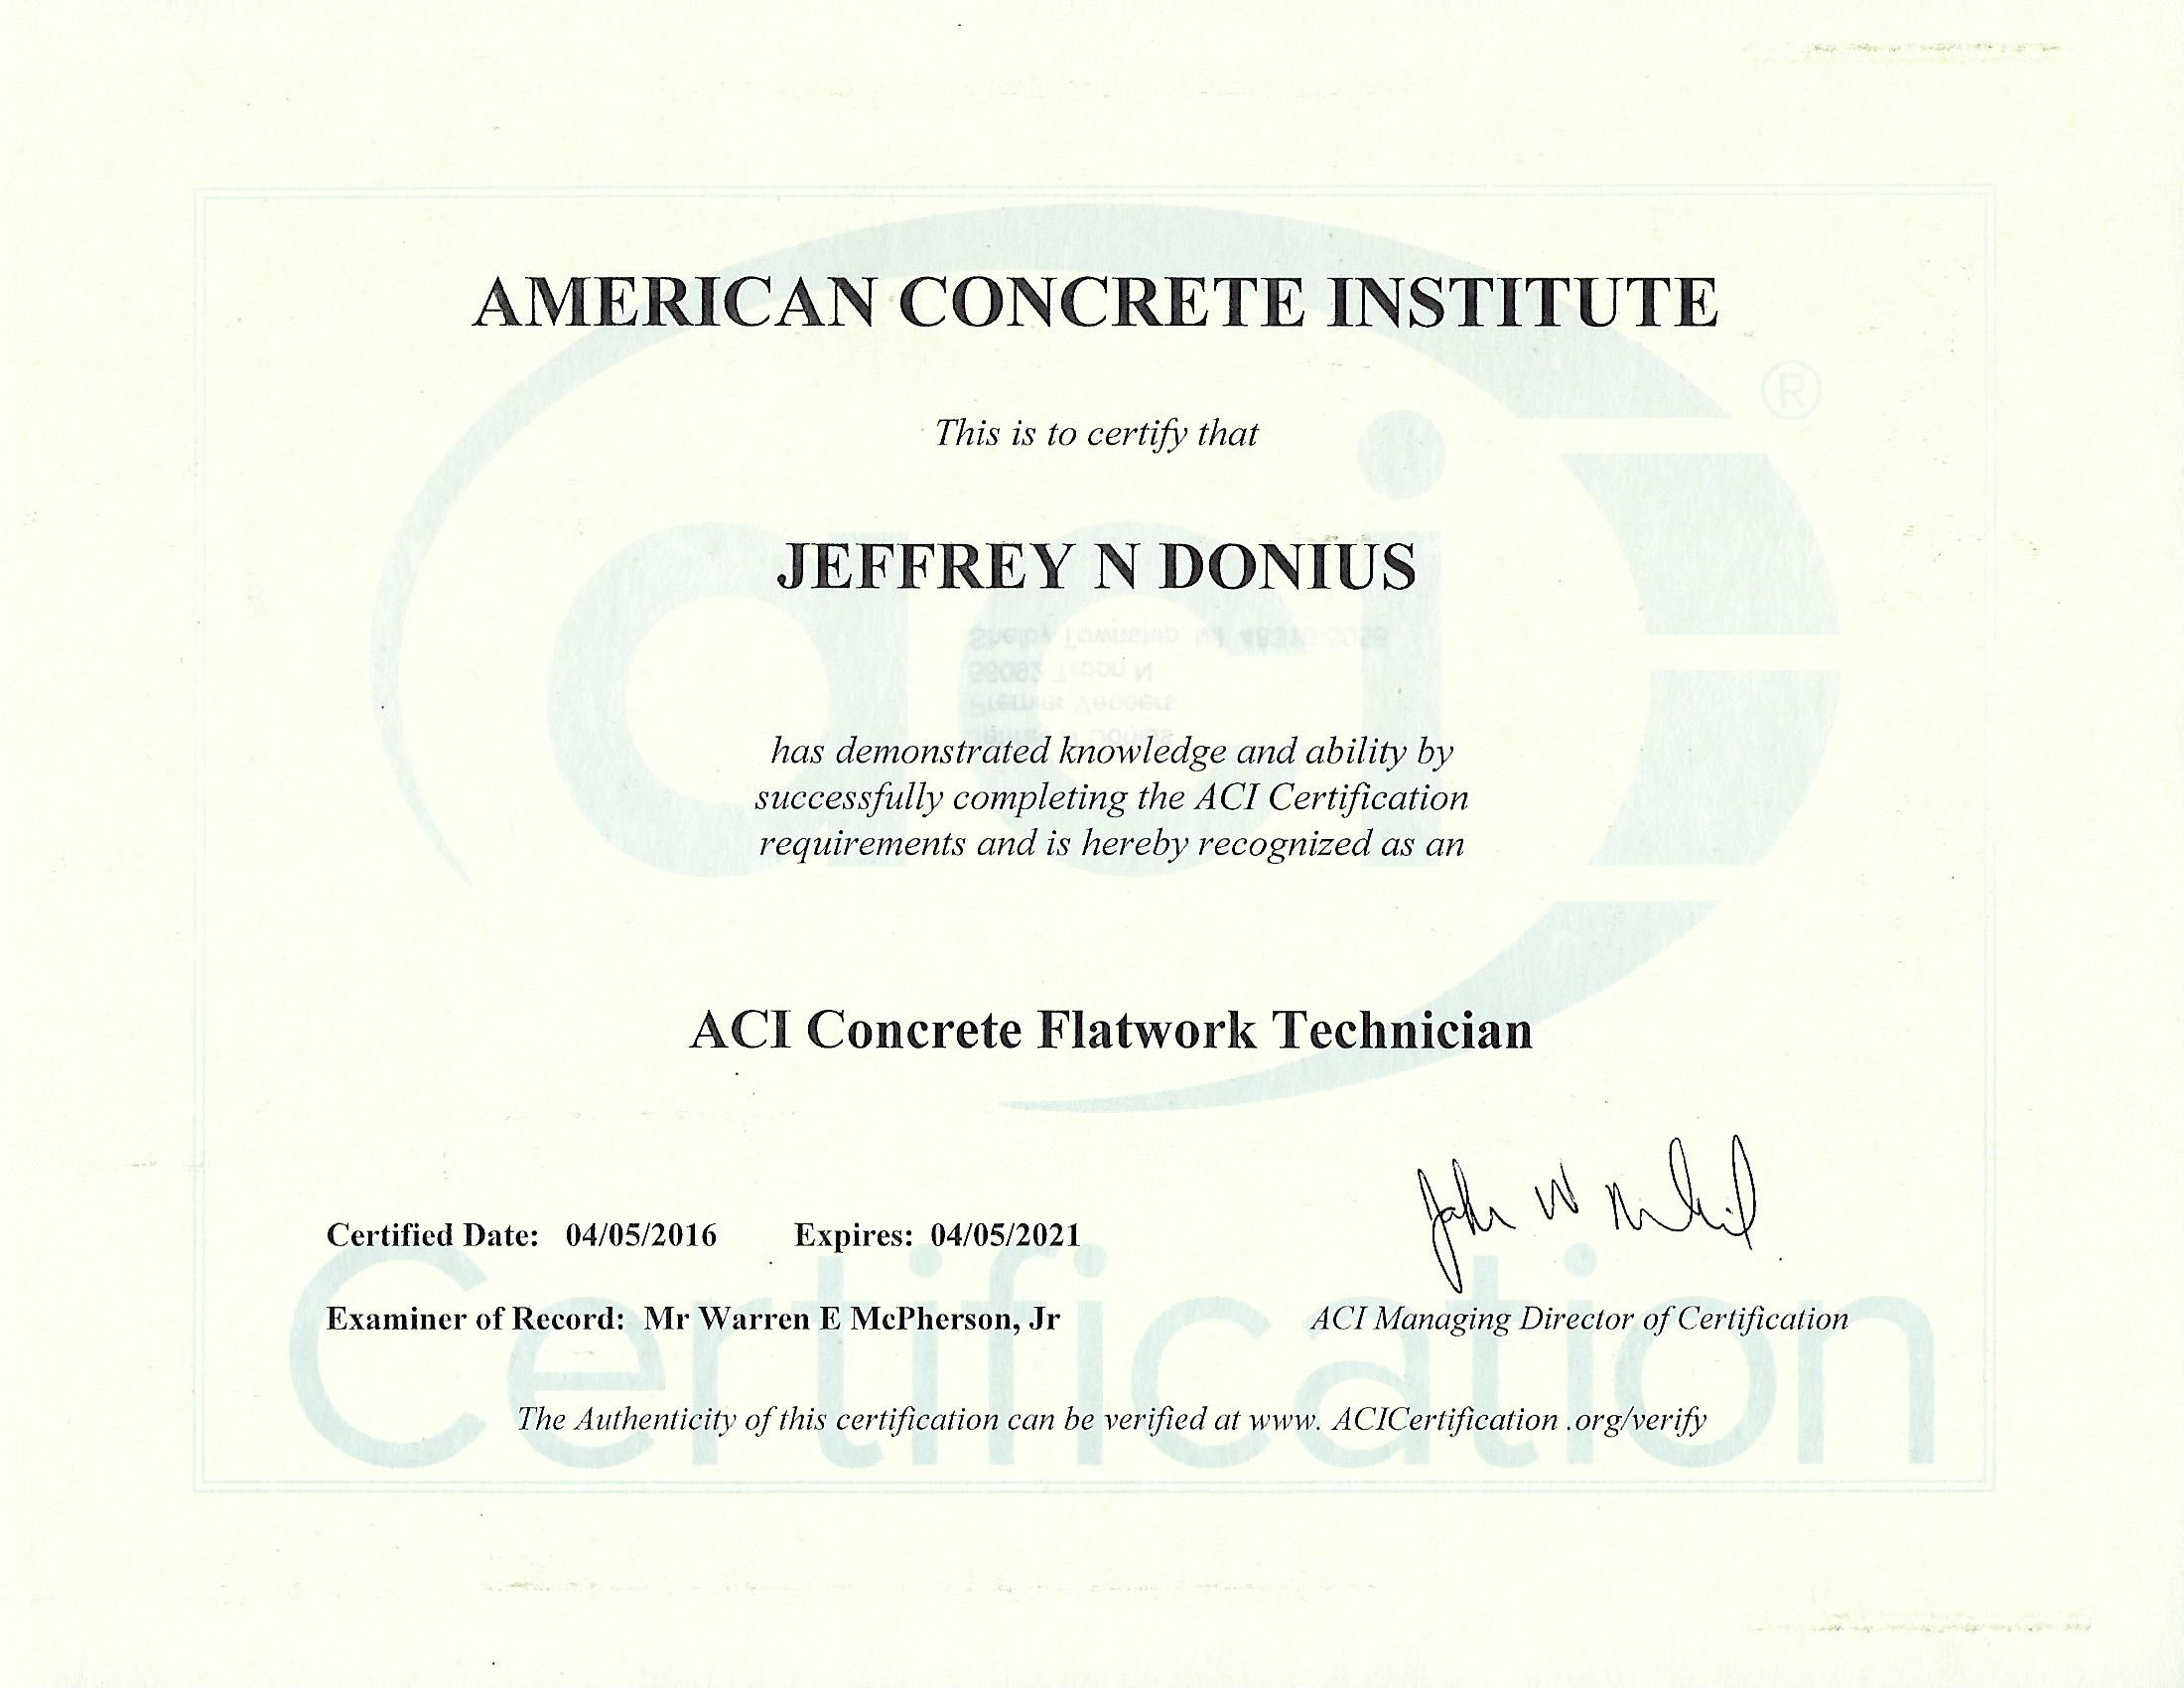 Flatwork Finisher Training Certificate From American Concrete Institute (ACI)